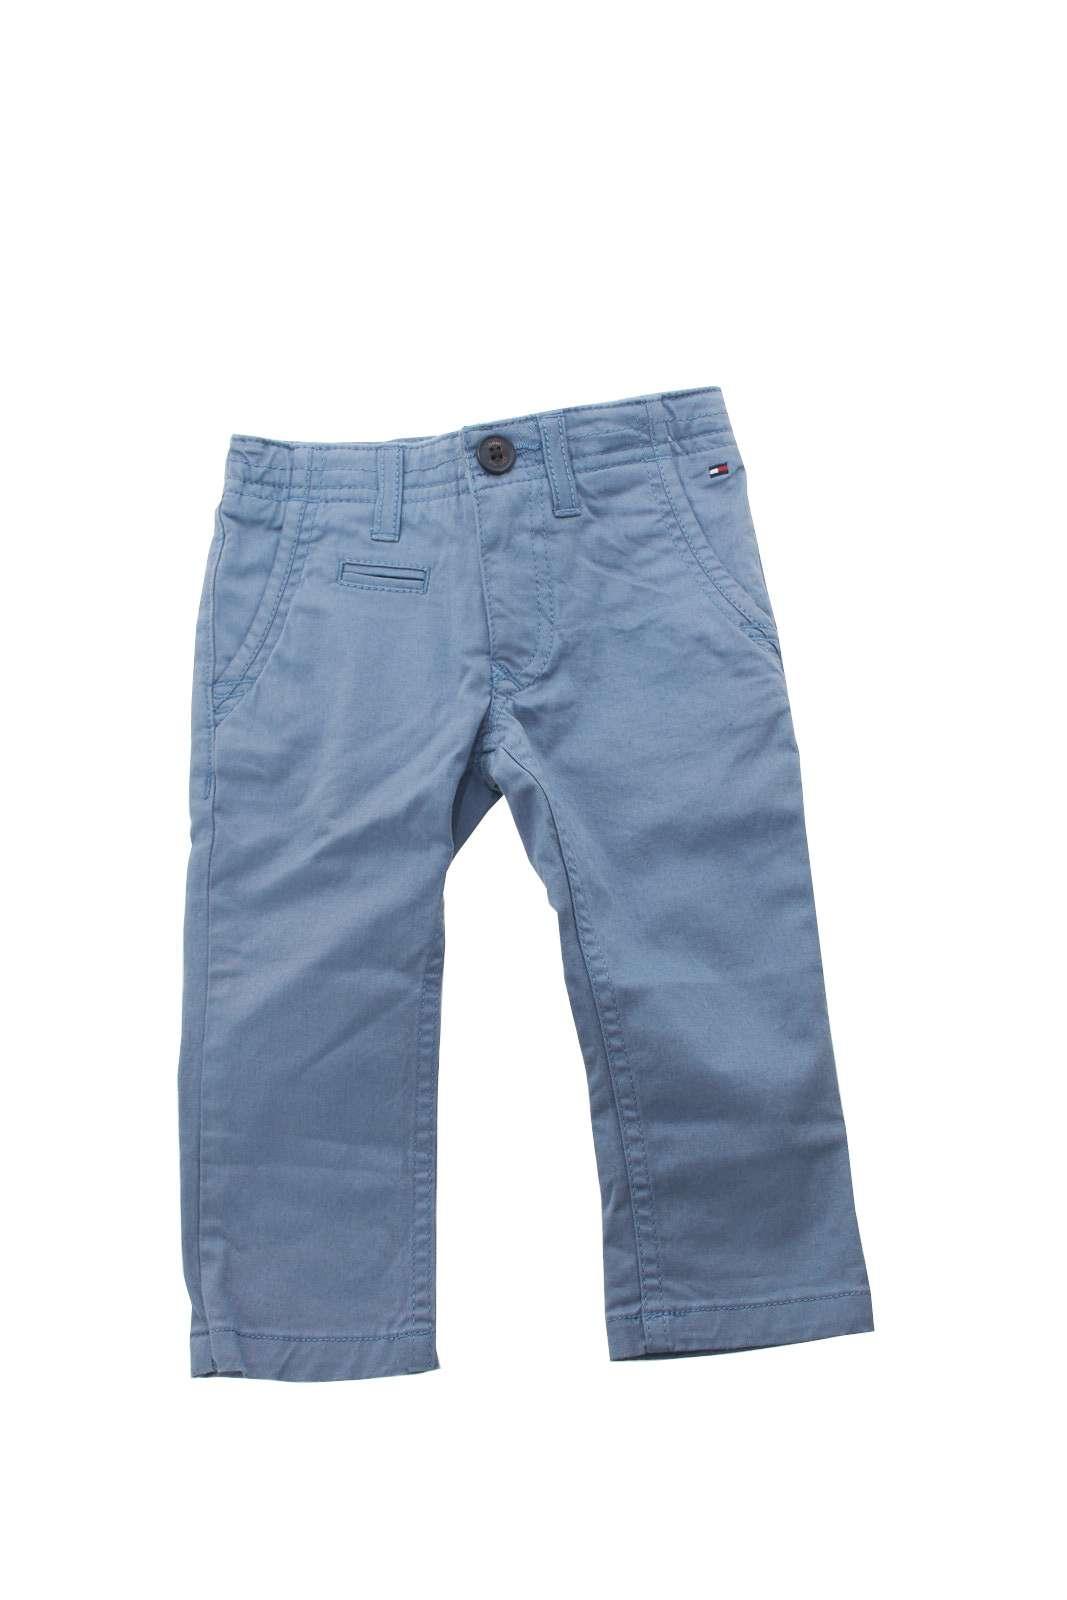 https://www.parmax.com/media/catalog/product/a/i/PE-outlet_parmax-pantaloni-bambino-Tommy-Hilfiger-KB0KB00273-A.jpg